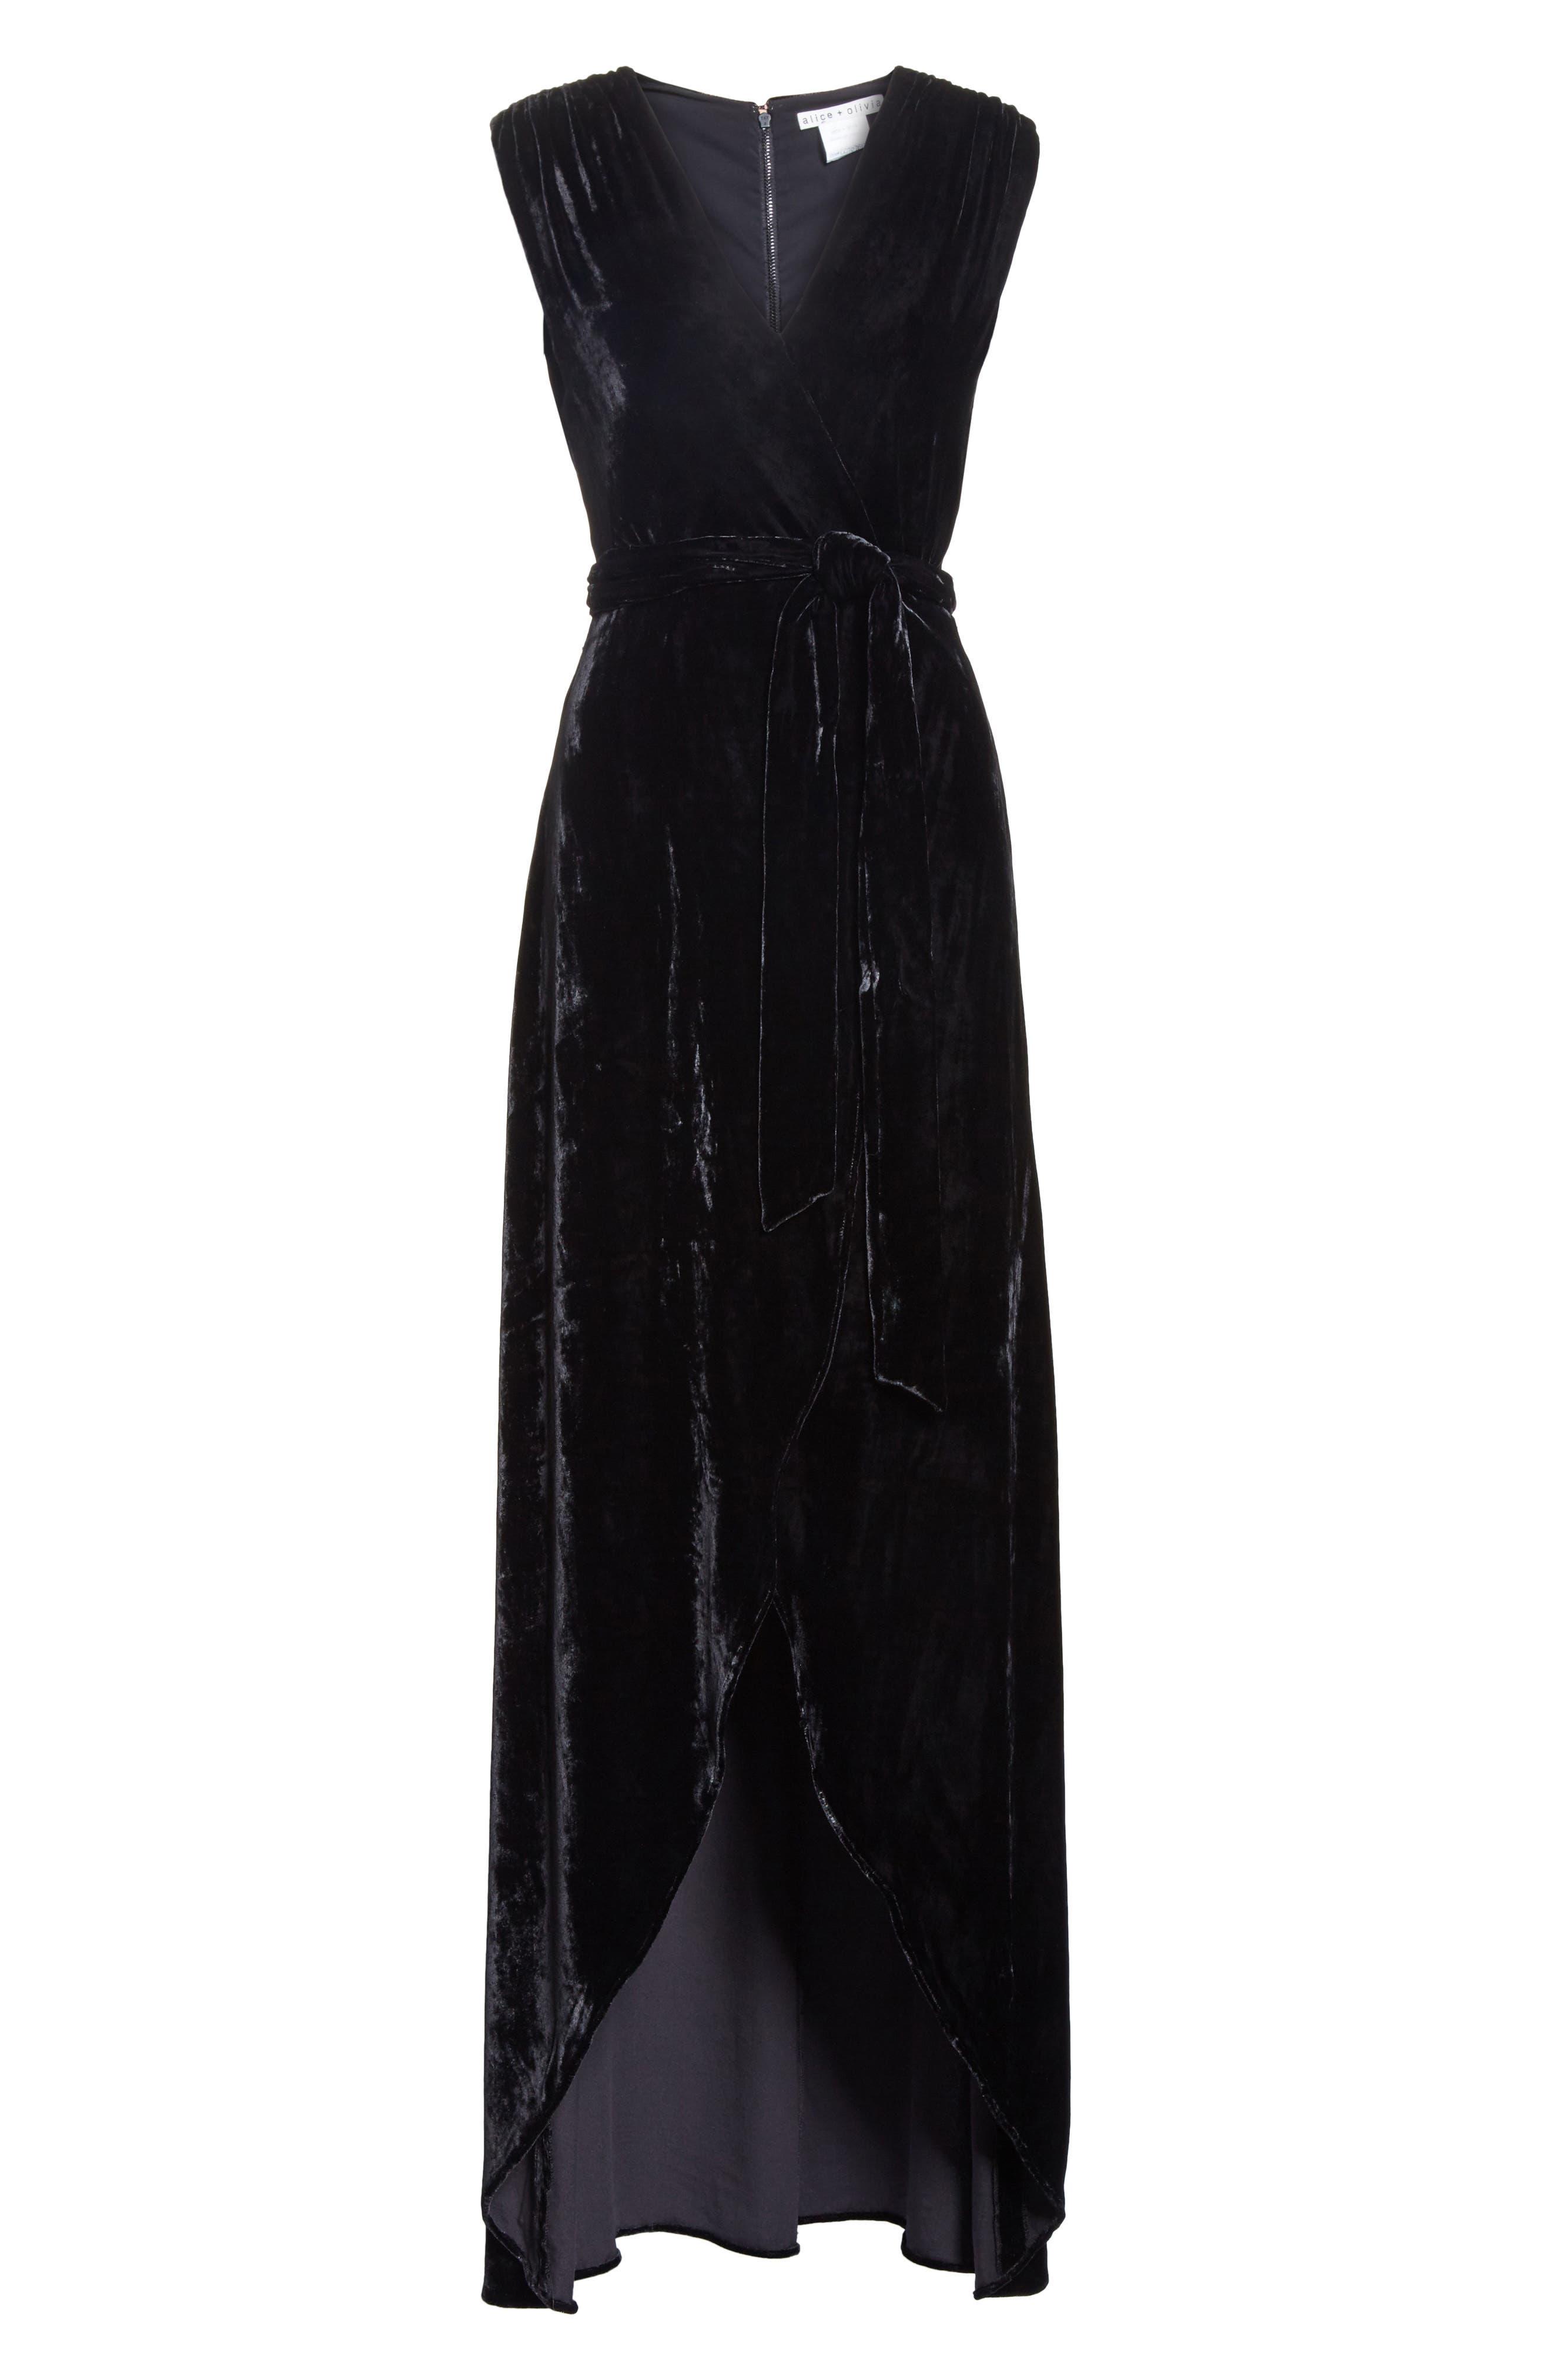 Simmons Velvet Wrap Maxi Dress,                             Alternate thumbnail 6, color,                             Black